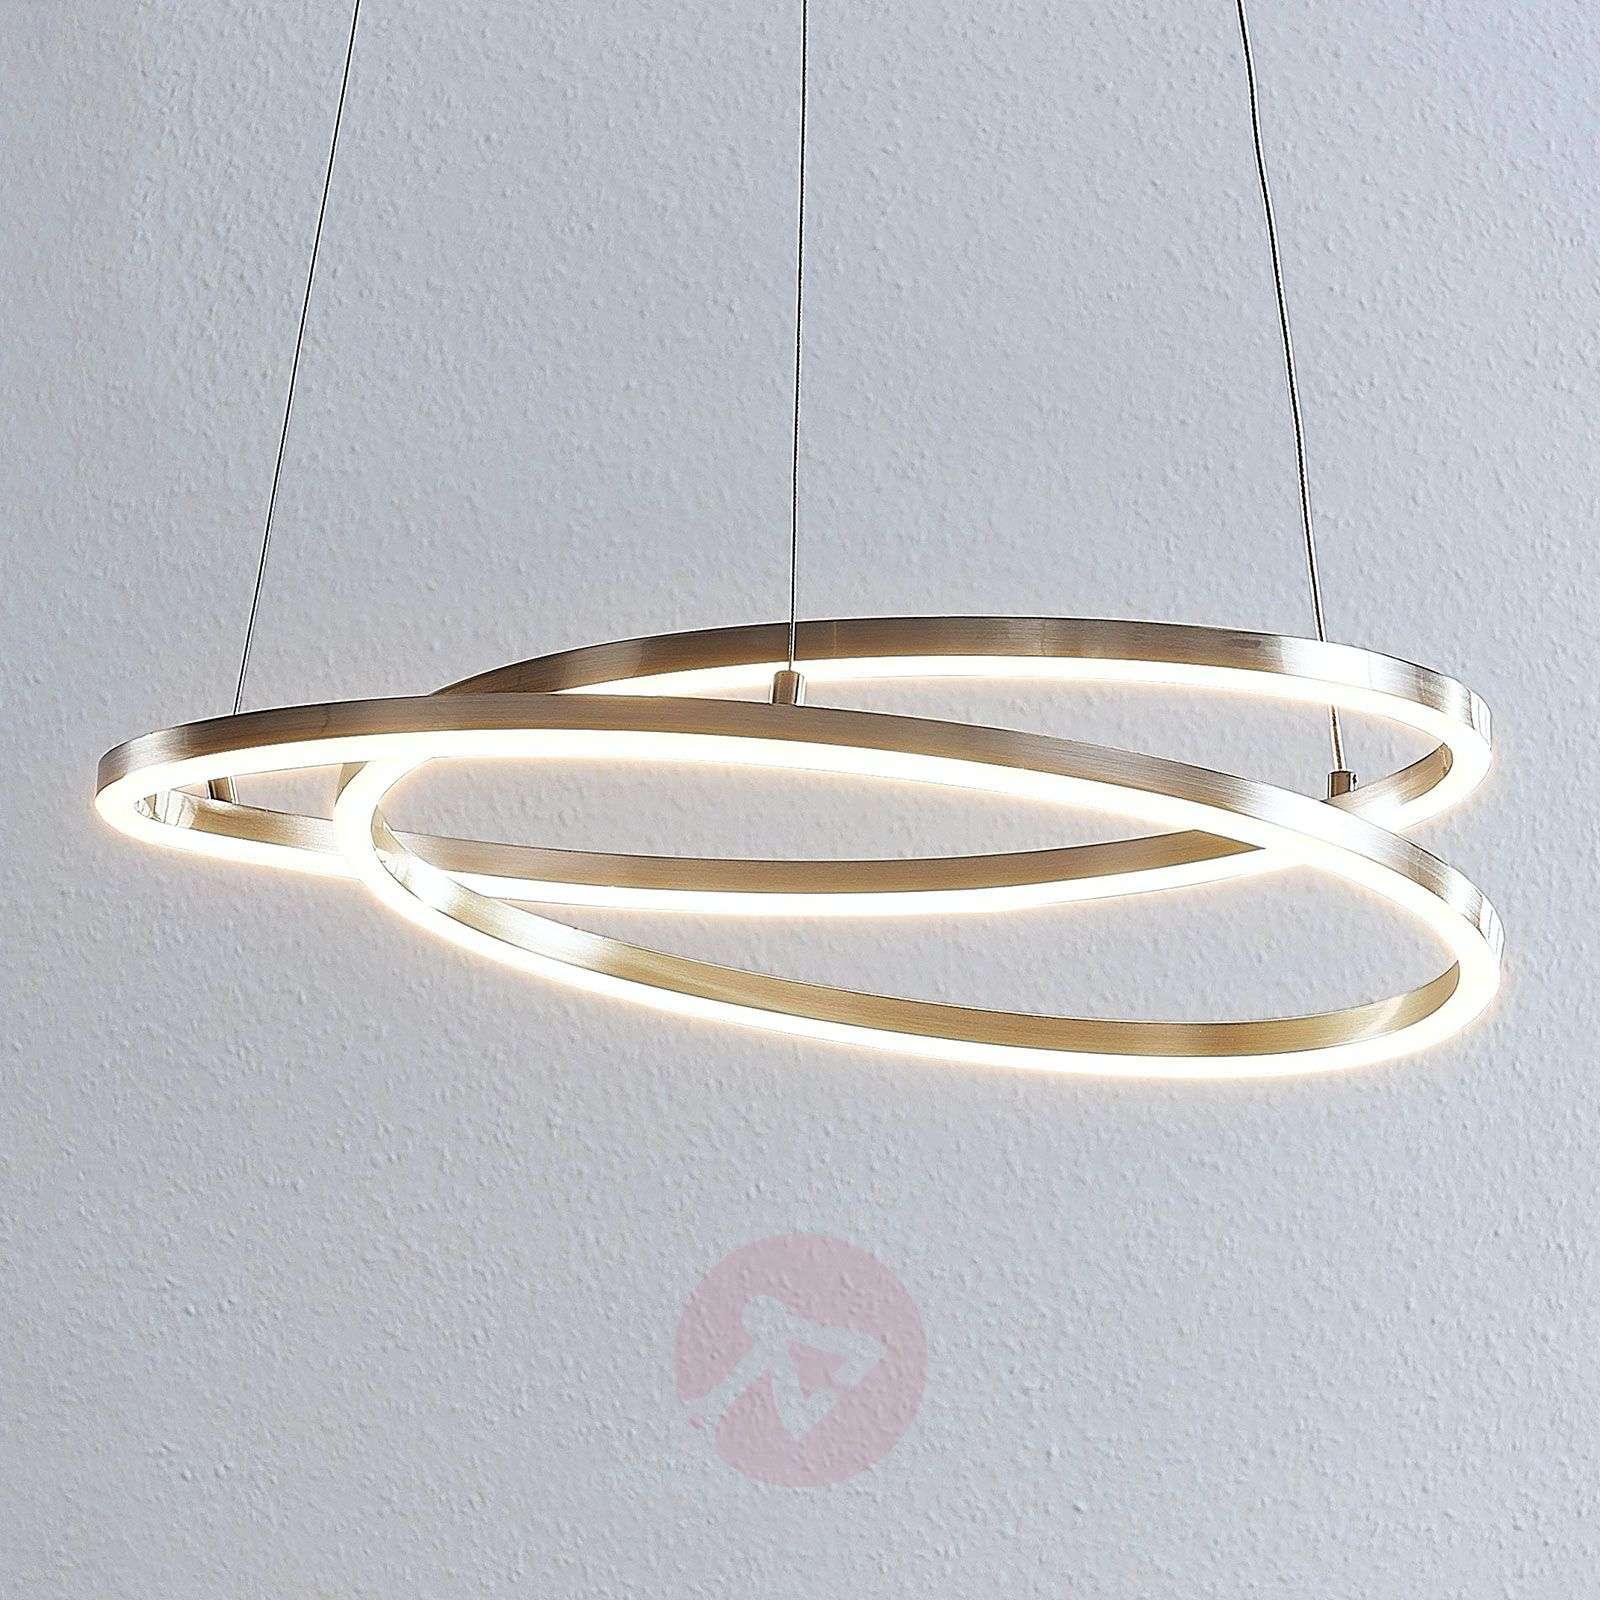 Lindby Davian LED-riippuvalaisin, nikkeli-9639137-02